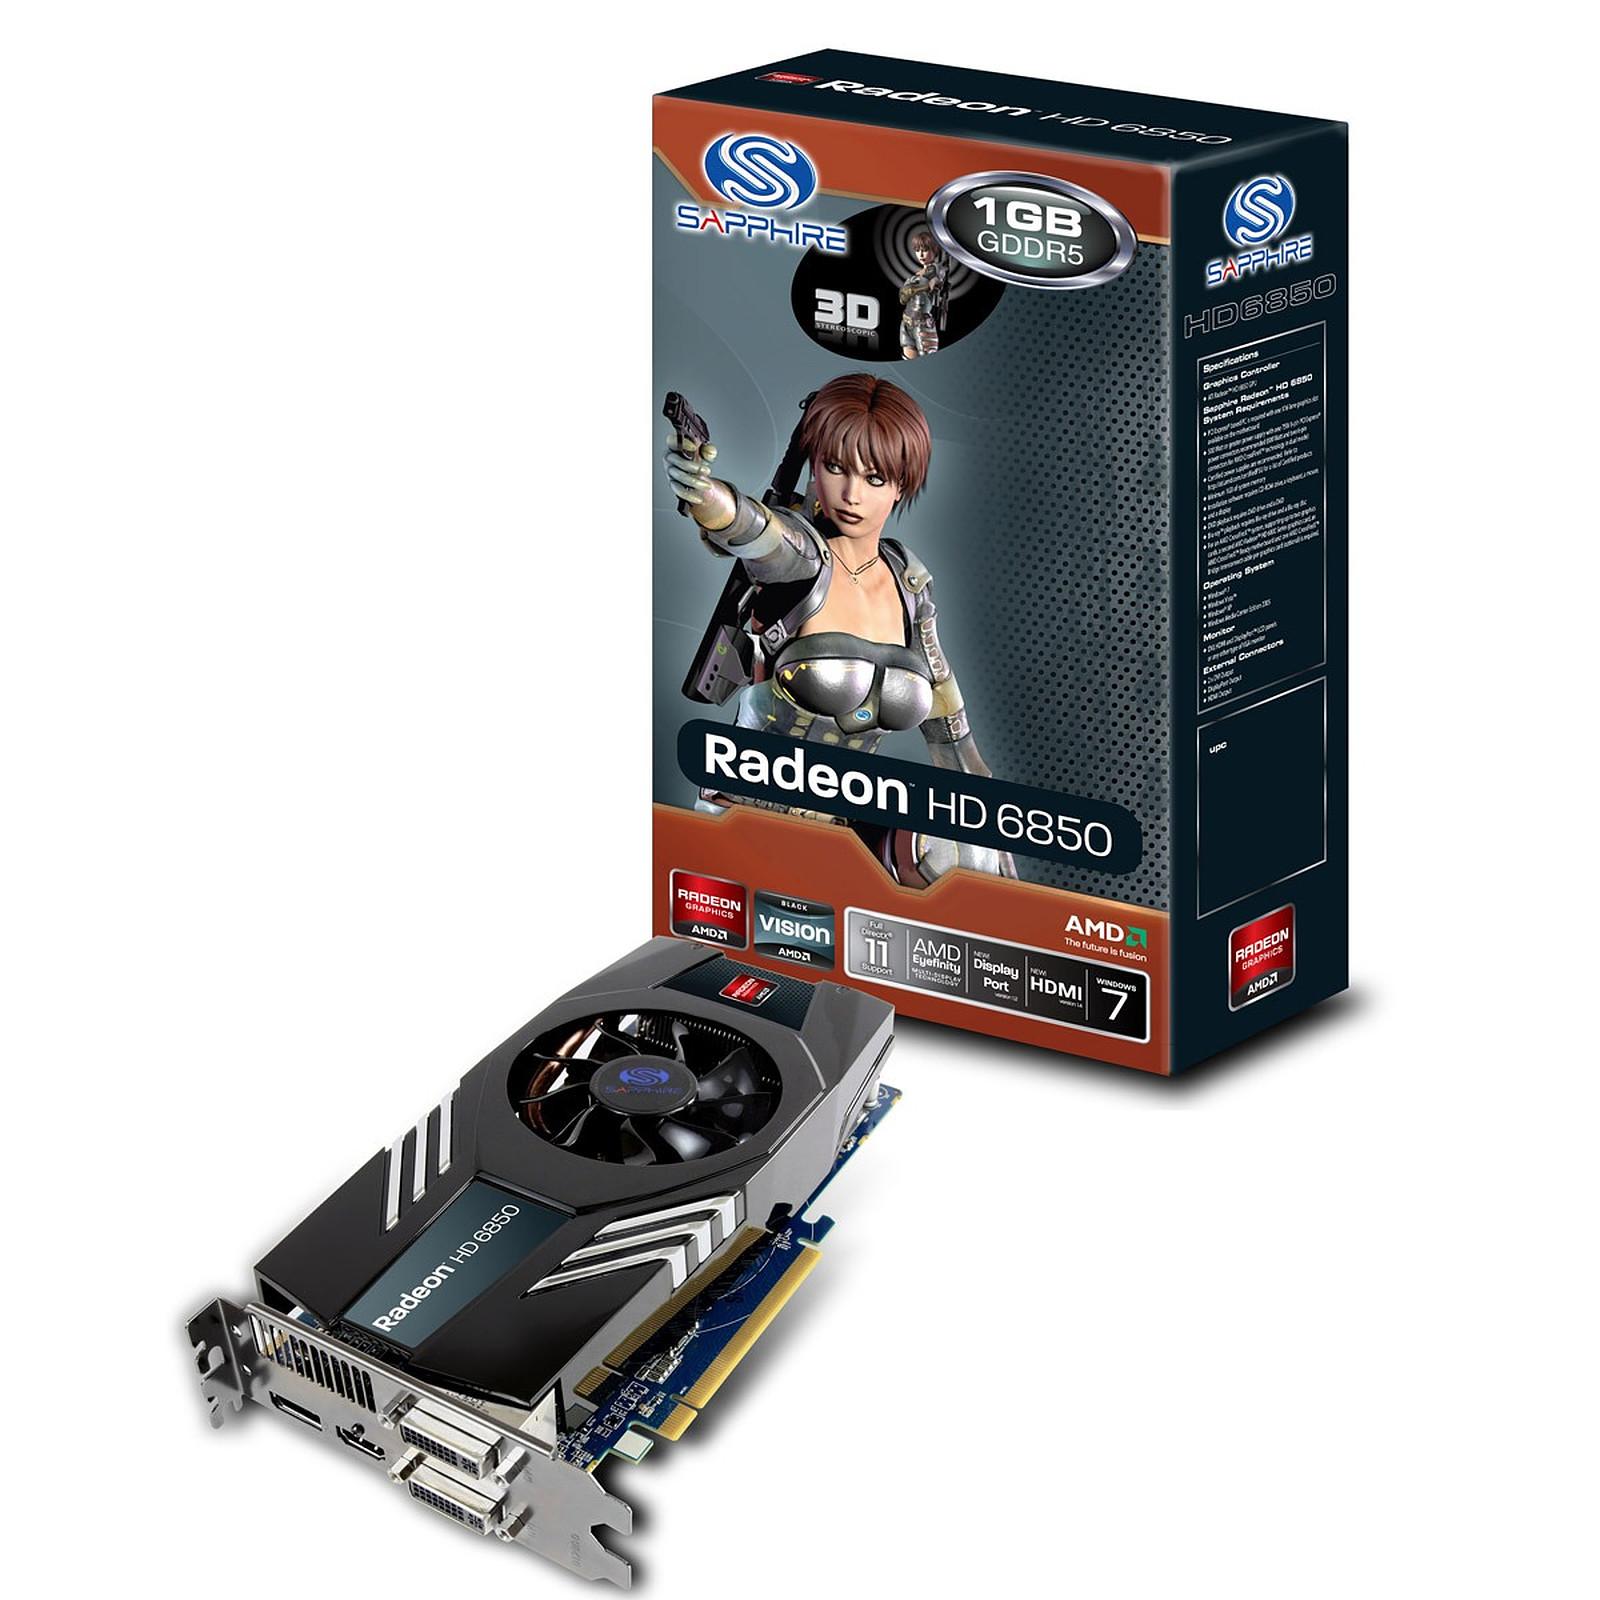 Sapphire Radeon HD 6850 1 GB